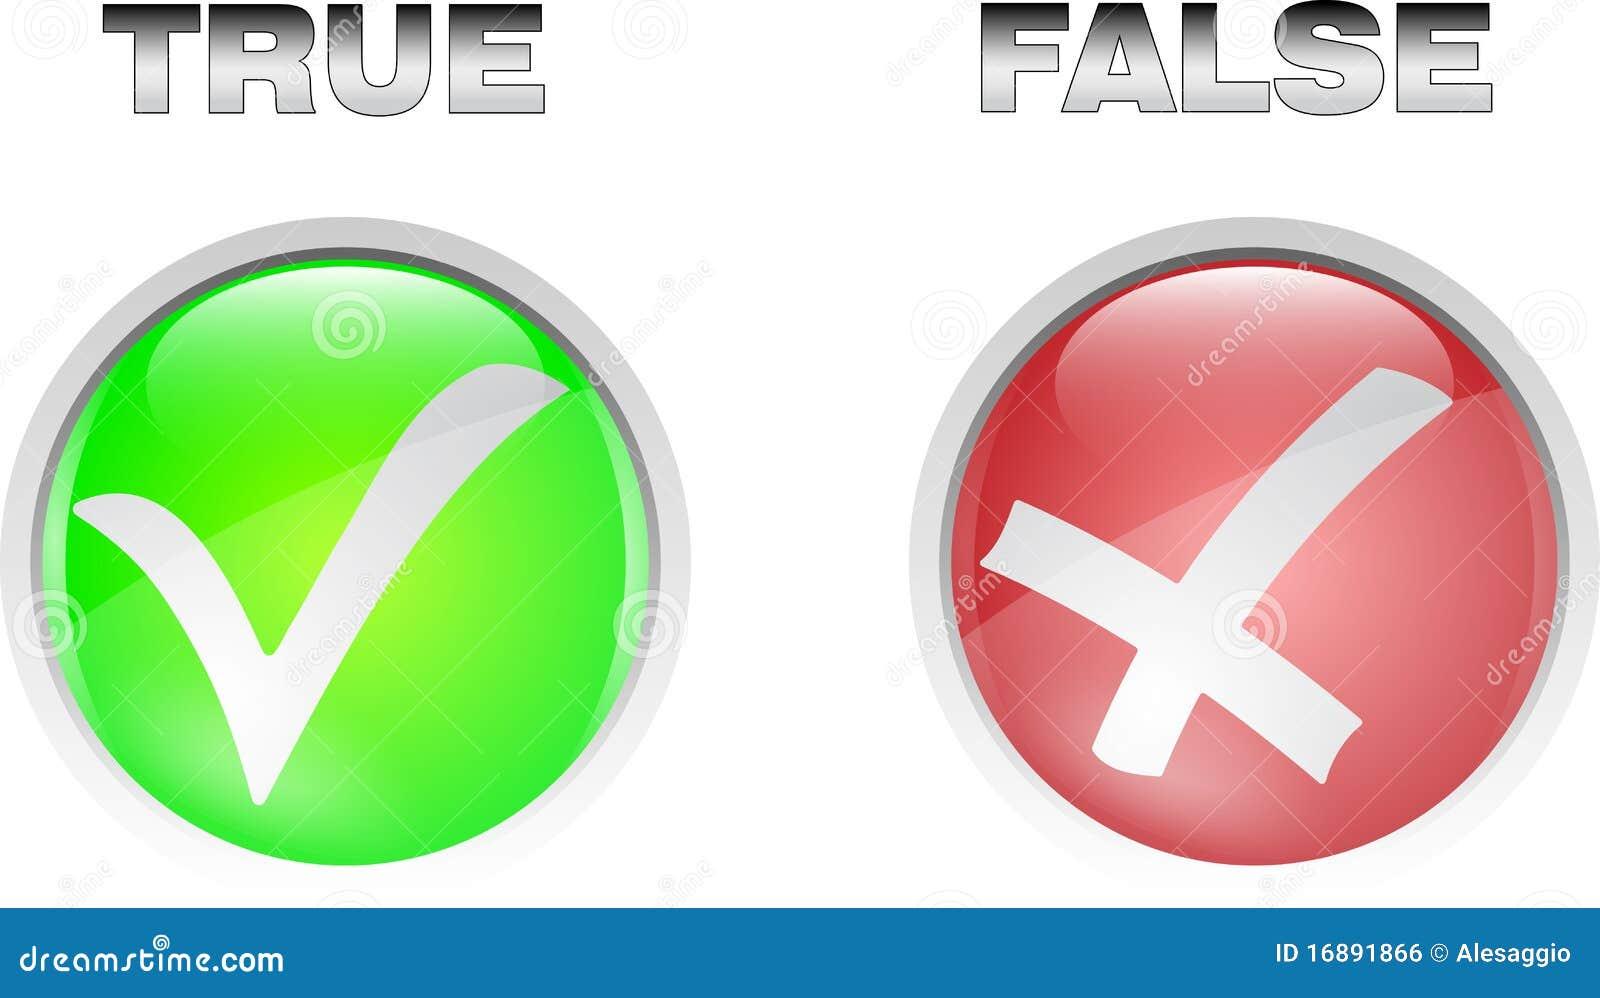 True False Button Stock Vector. Image Of Allowed, Icon